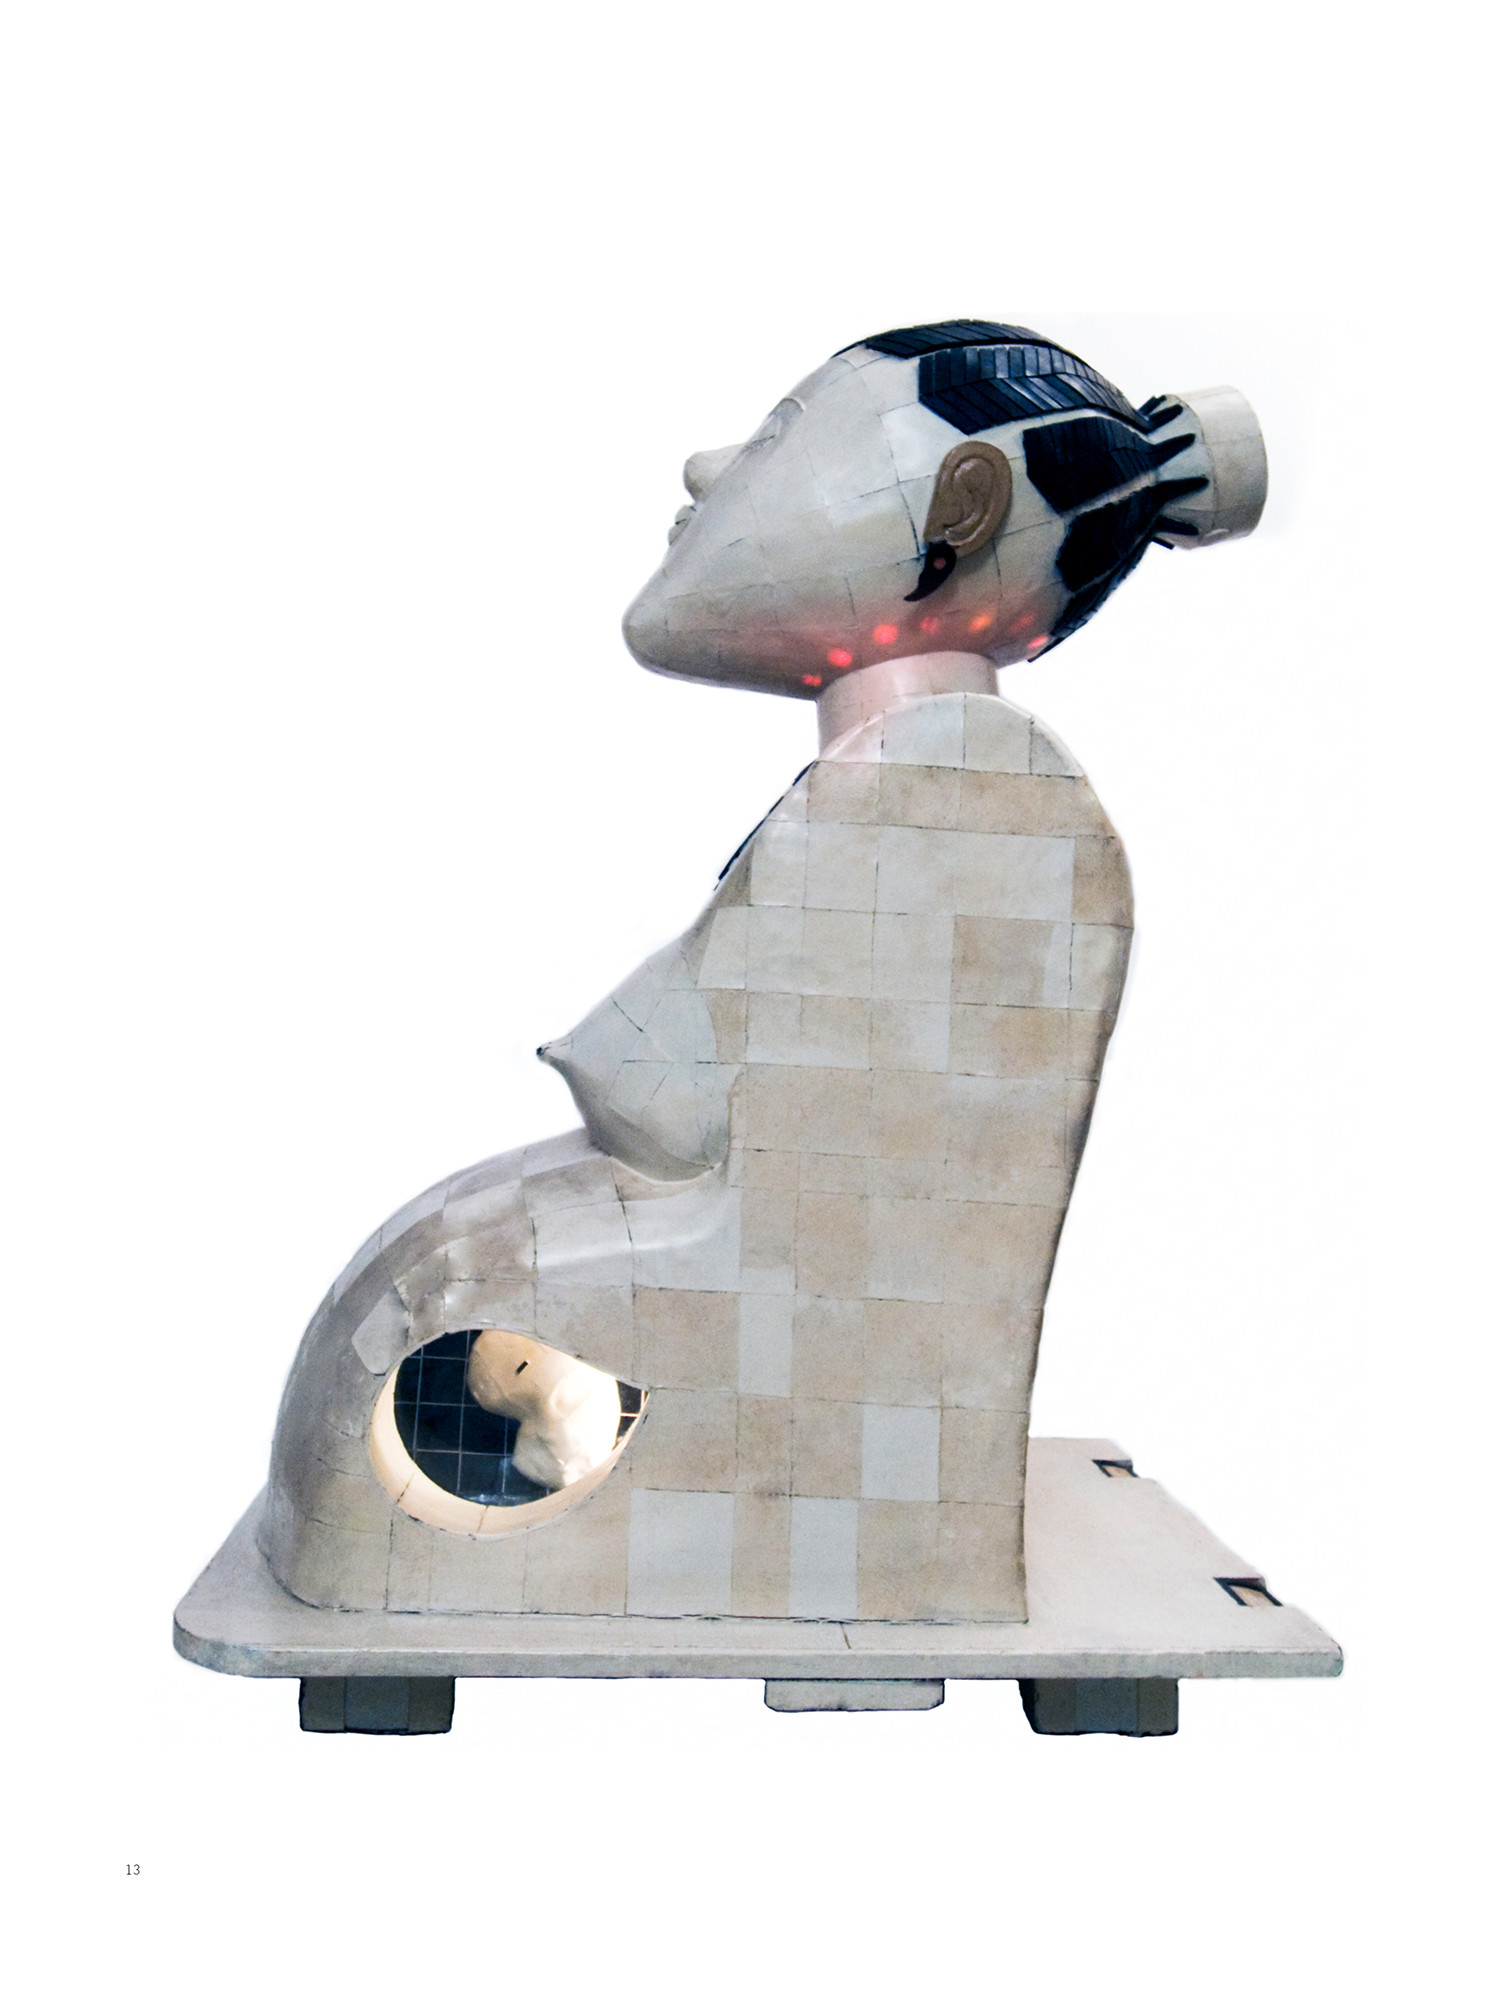 Pume Bylex, 'La Maternité', sculpture mix media, 1992